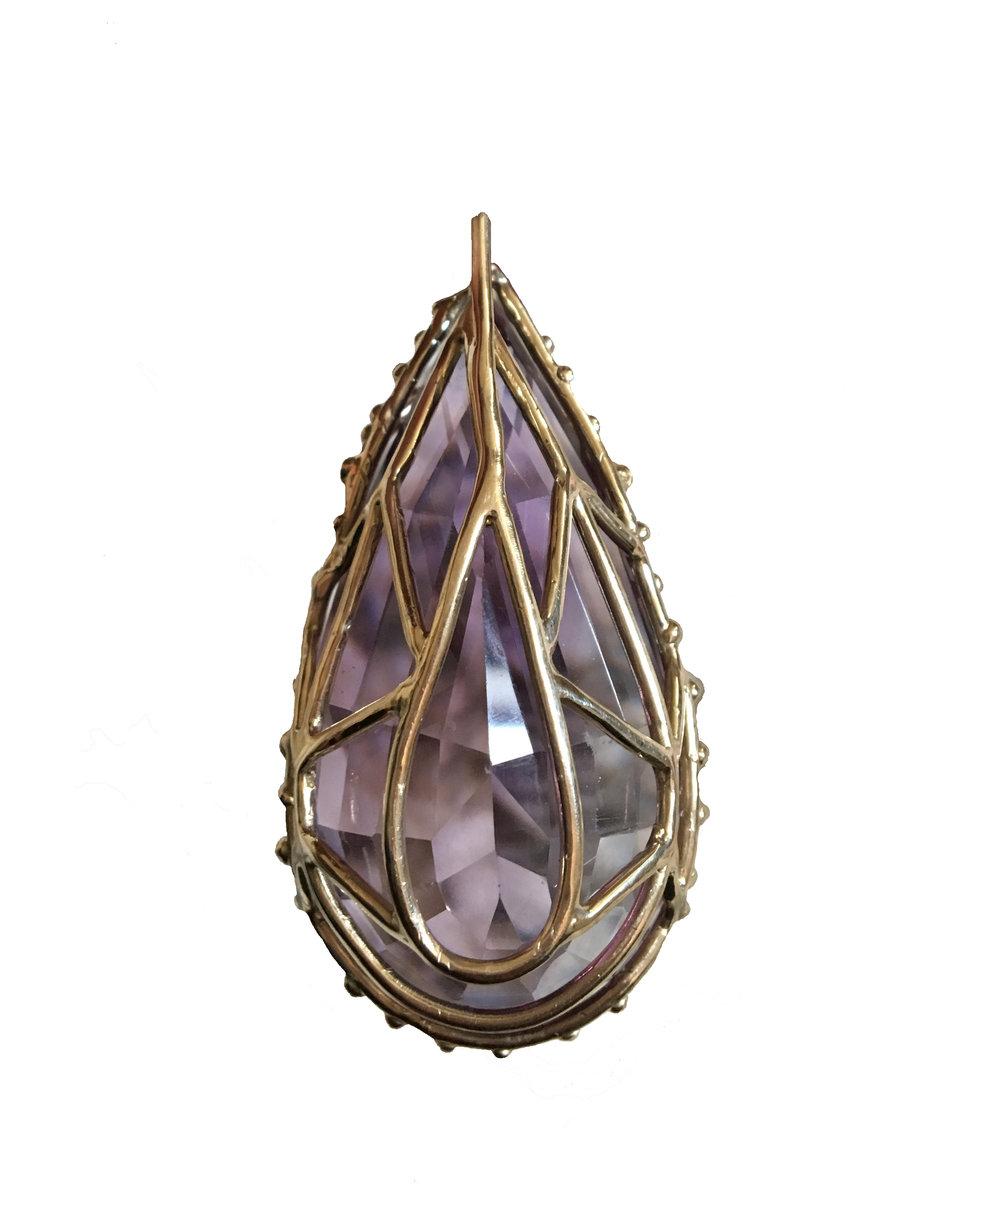 Back of amethyst pendant